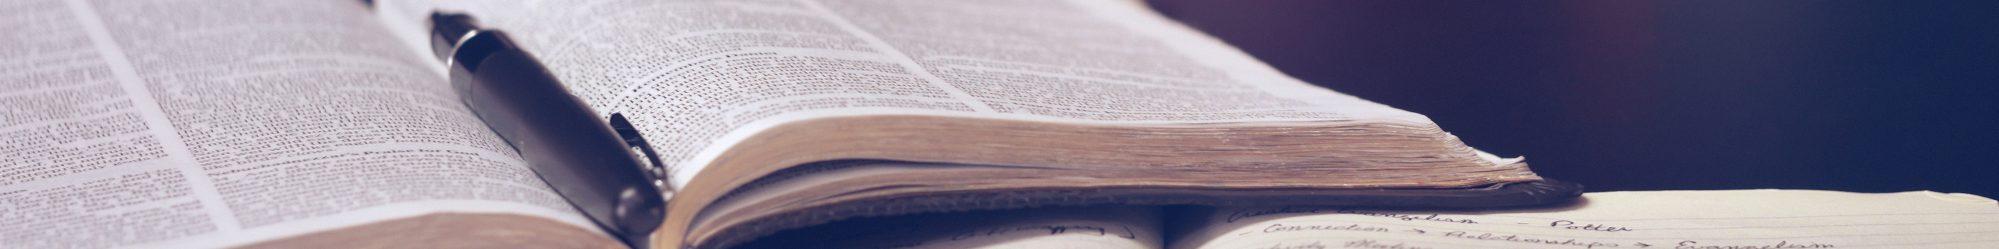 book thin image Oana Harrison marketing